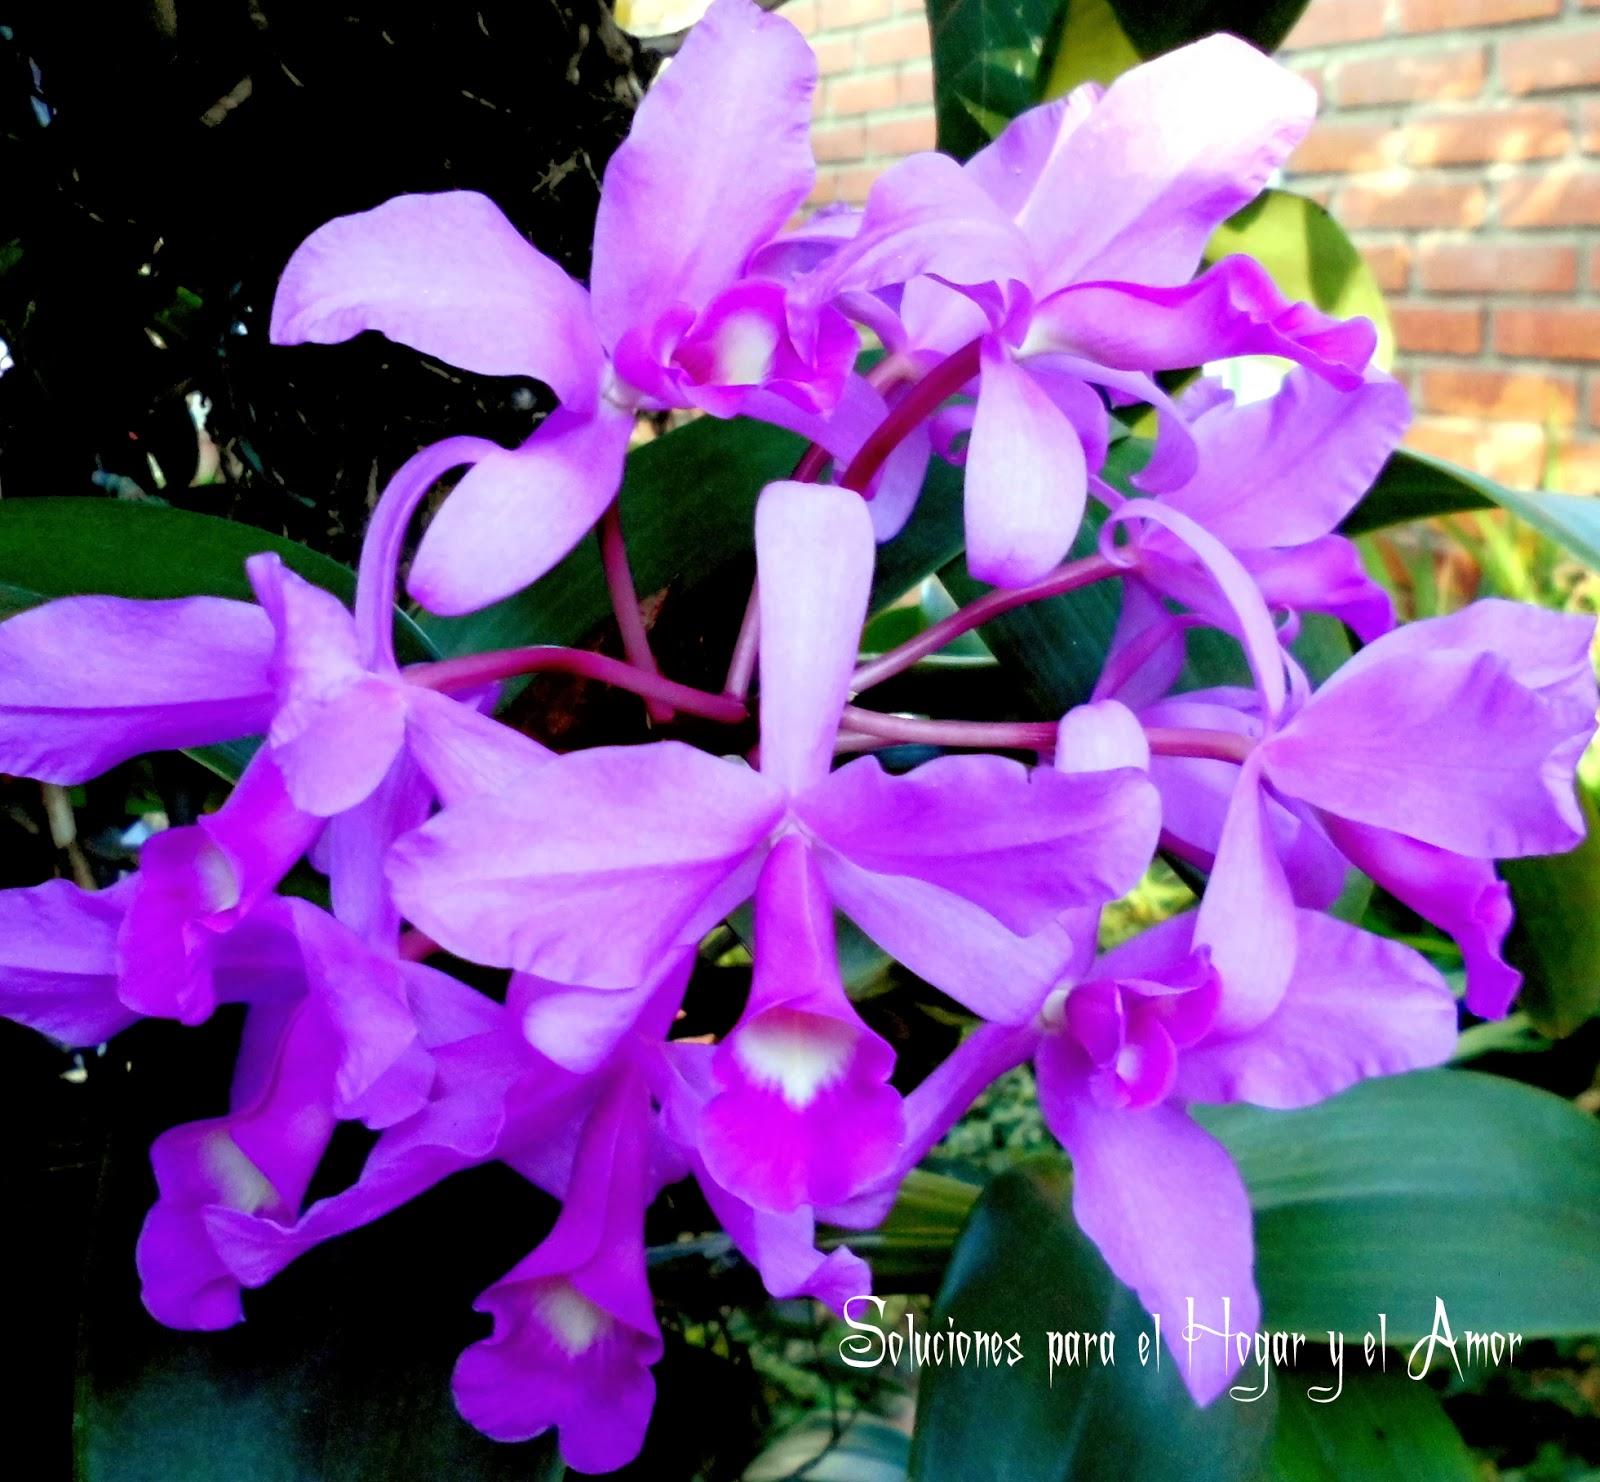 Orquídea Cattleya Skinneri, flores moradas, hermosas flores